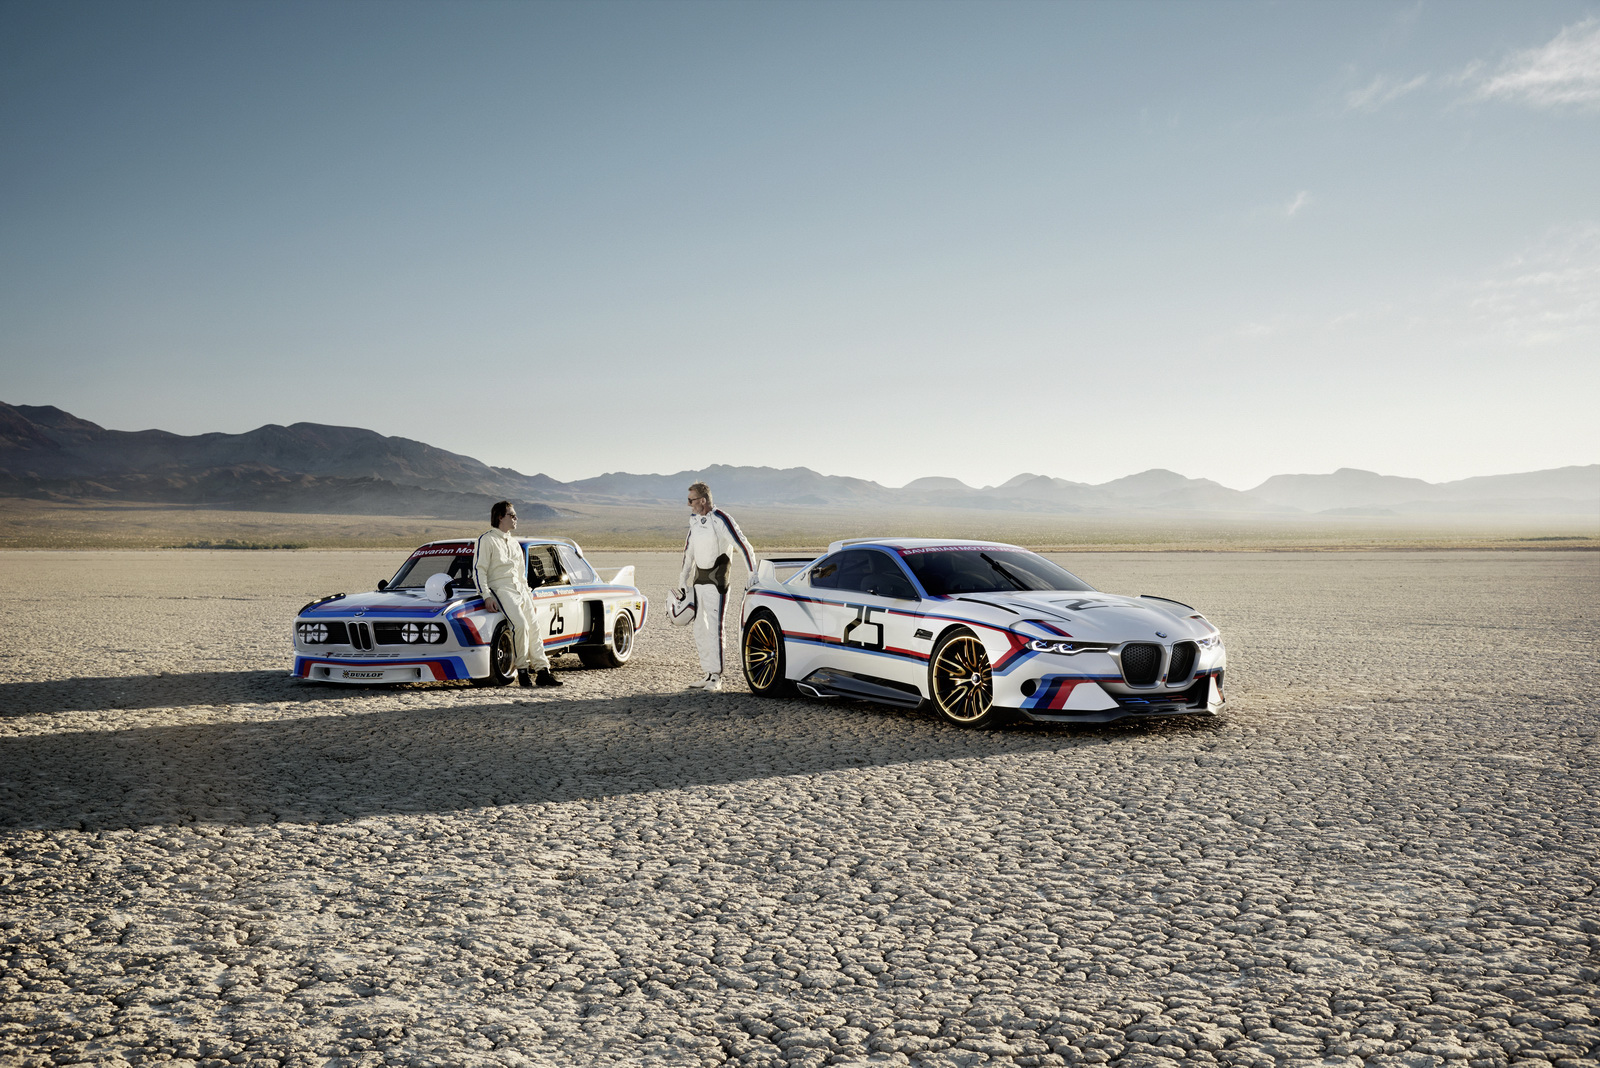 BMW-30-Hommage-R-Concept-11